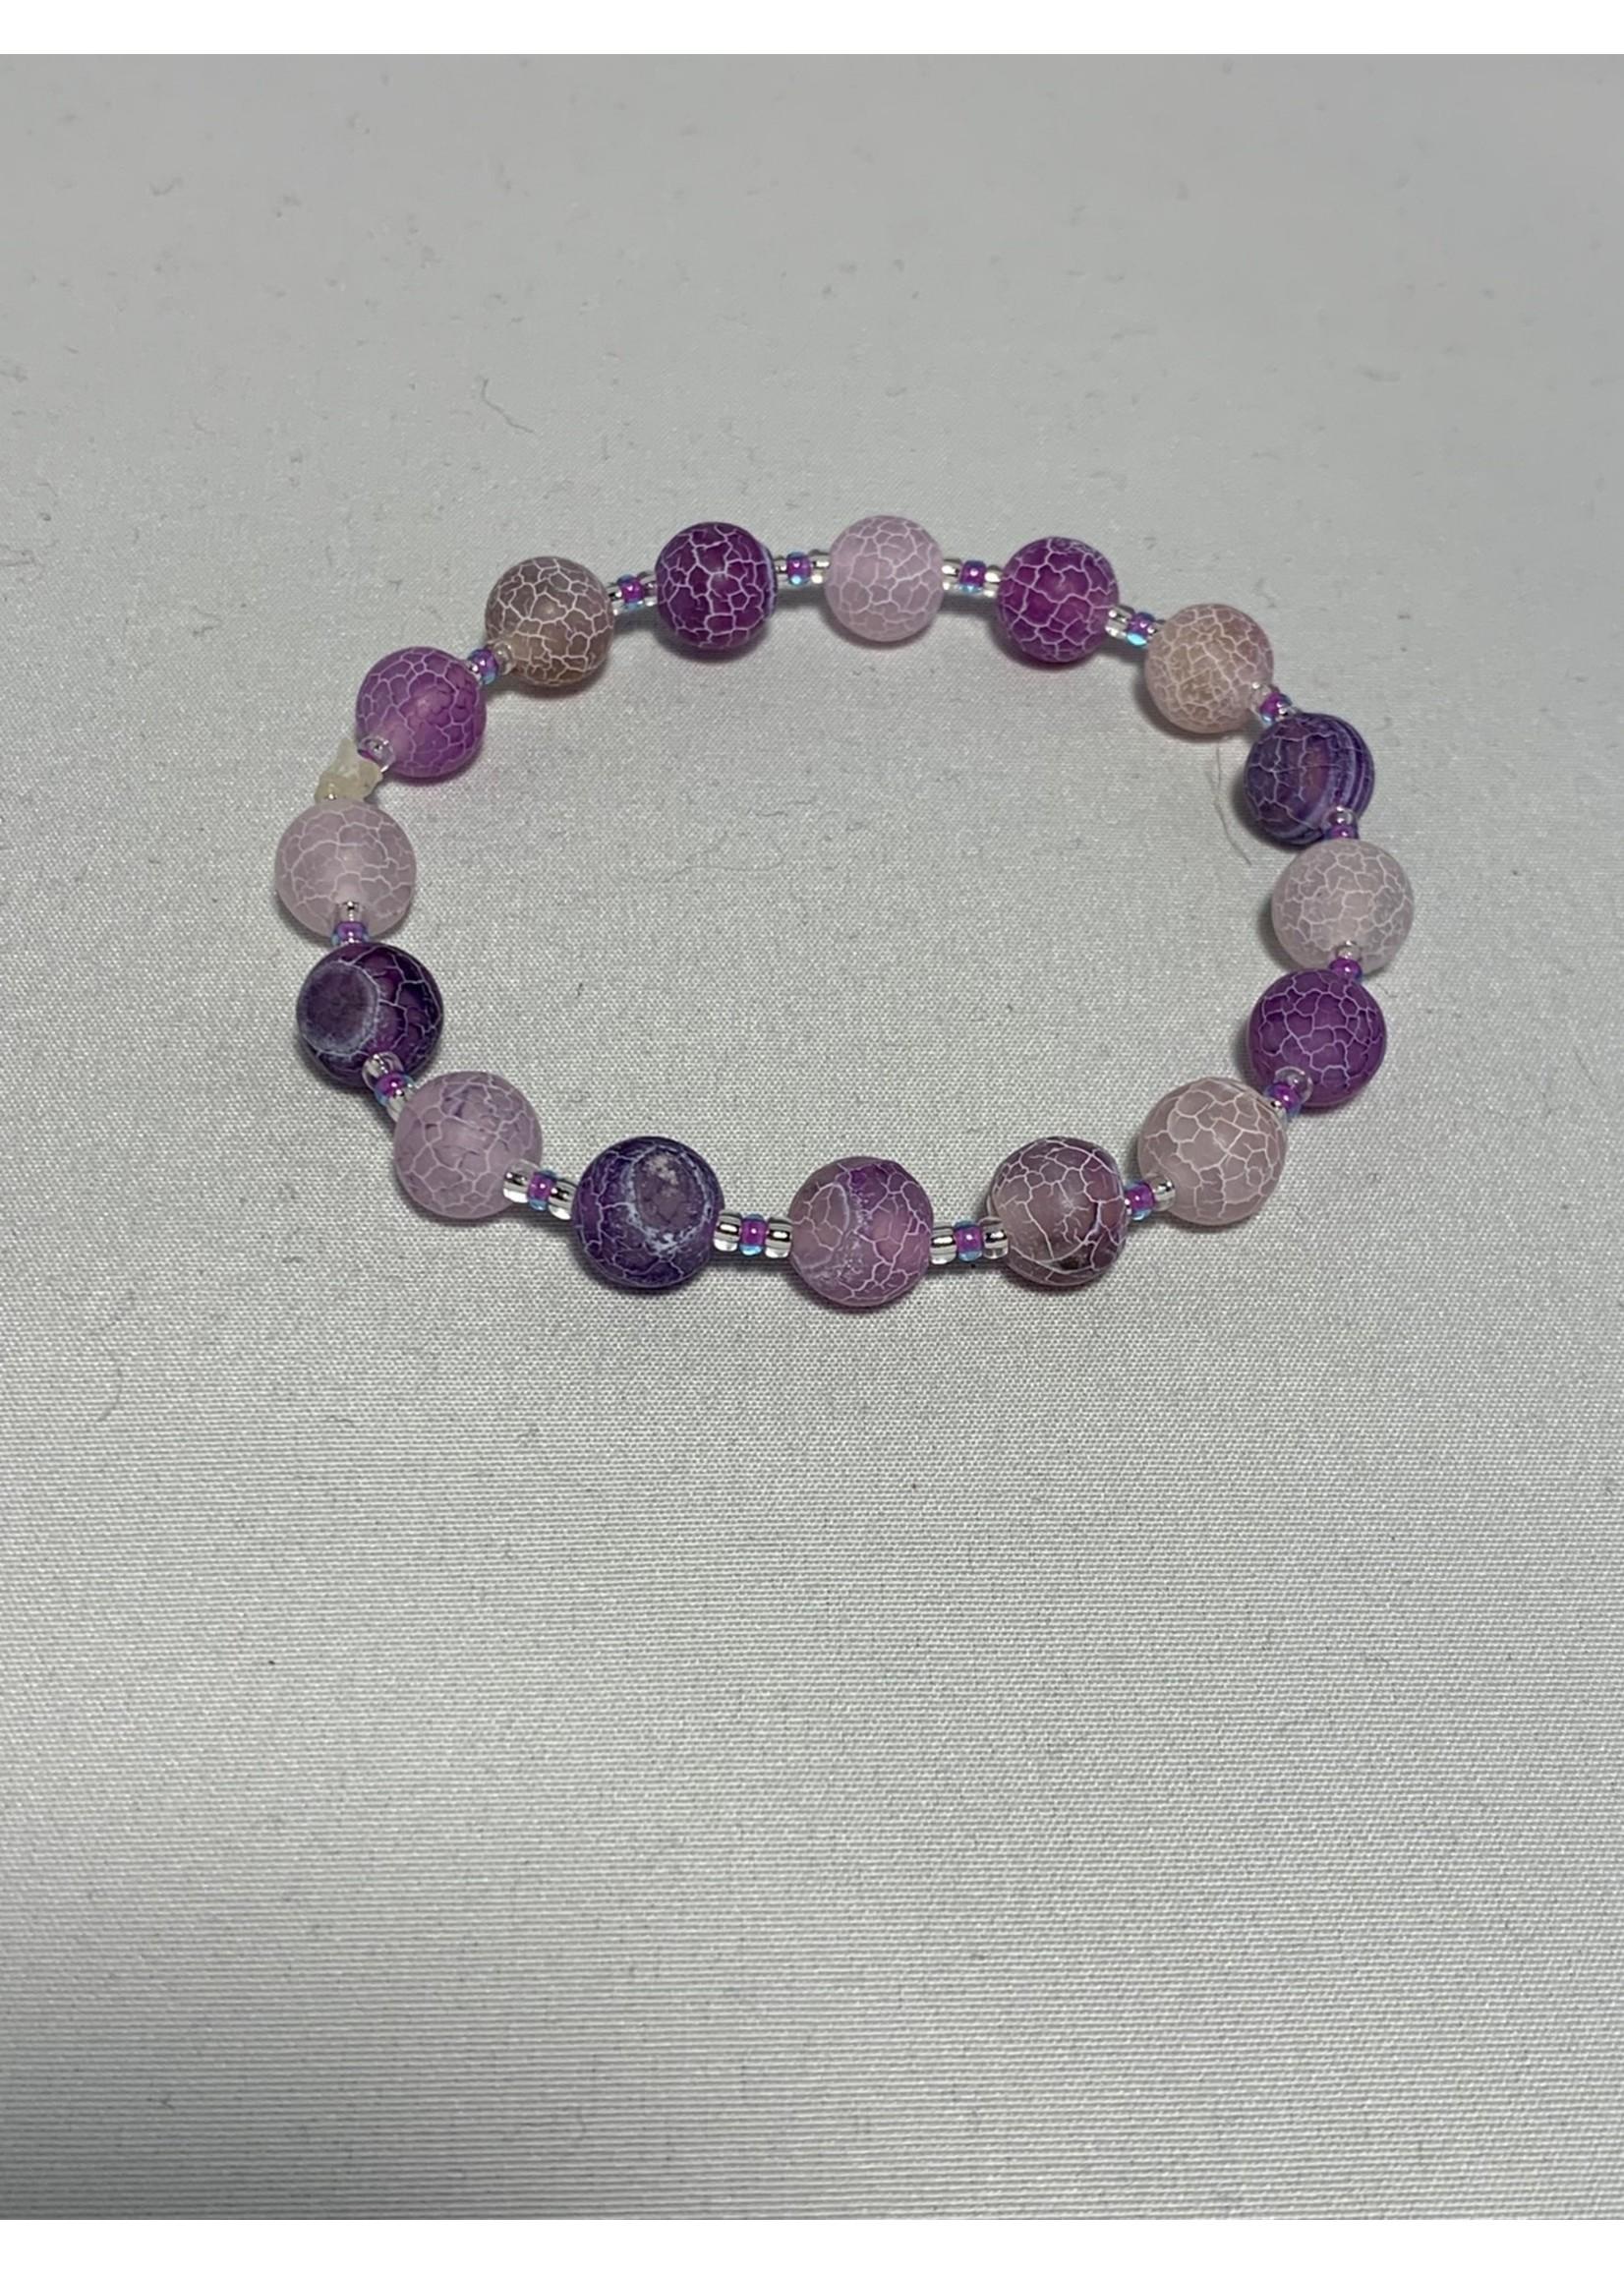 Stretch Bracelet Purple Agate Beads